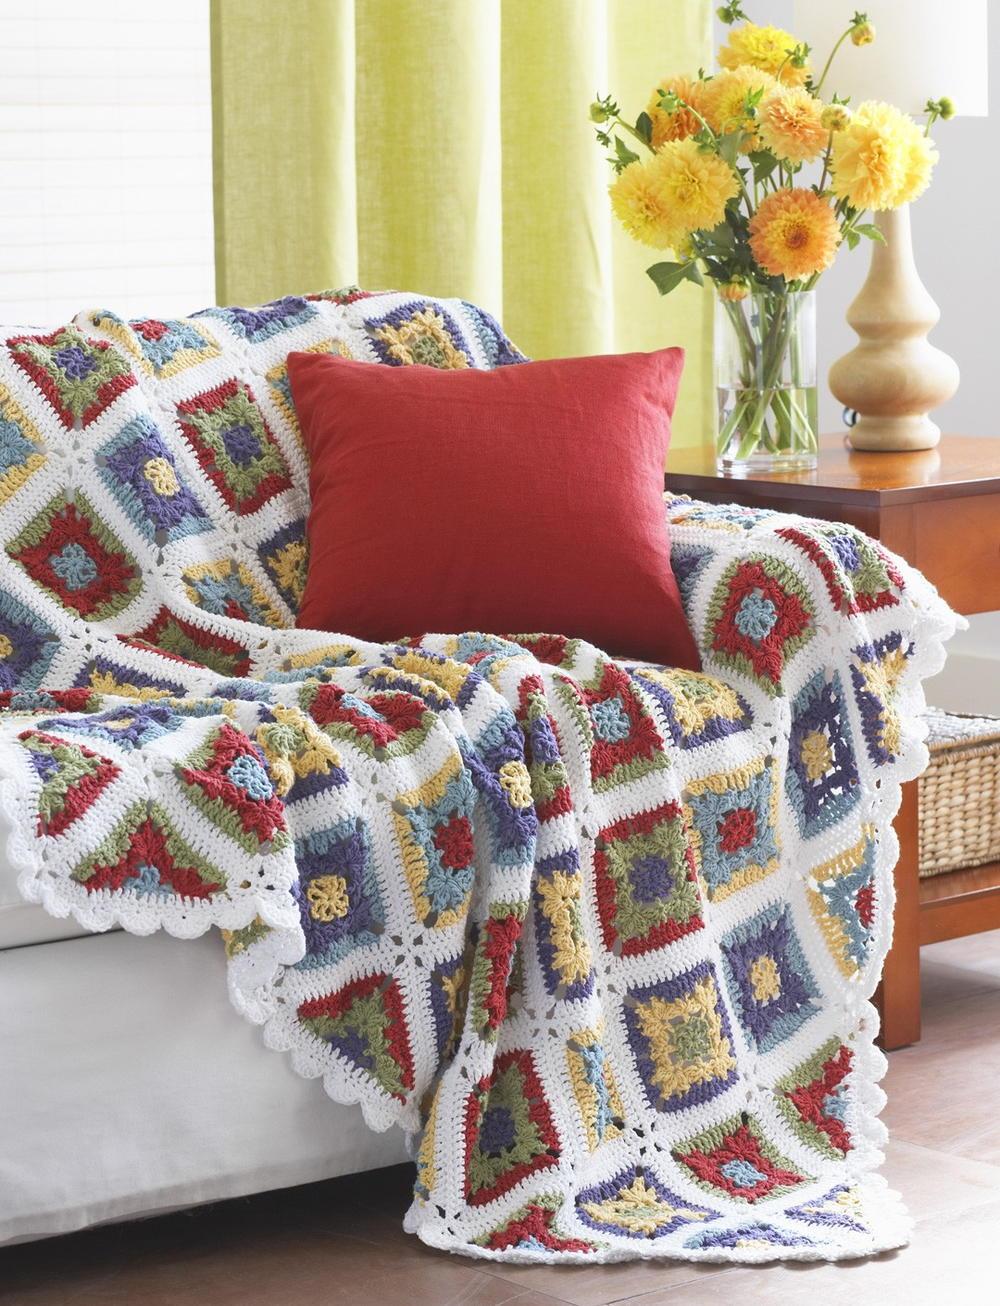 Crochet Pattern For Granny Blanket : Country Charm Crochet Blanket Pattern ...